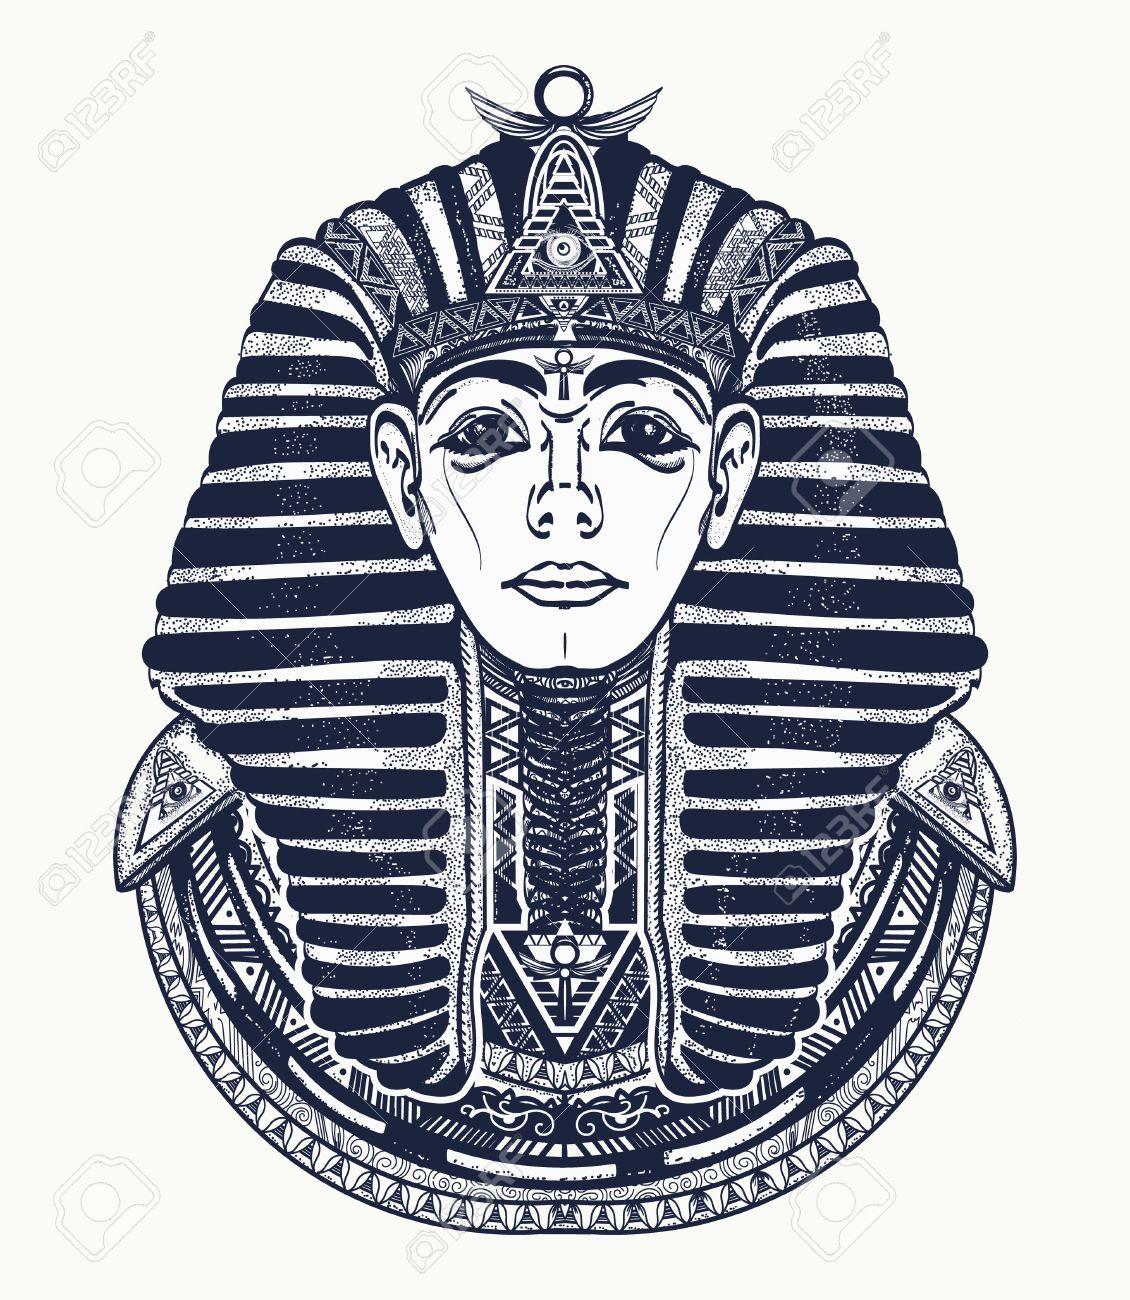 1130x1300 Pharaoh Tattoo Art, Egypt Pharaoh Graphic, T Shirt Design. Great